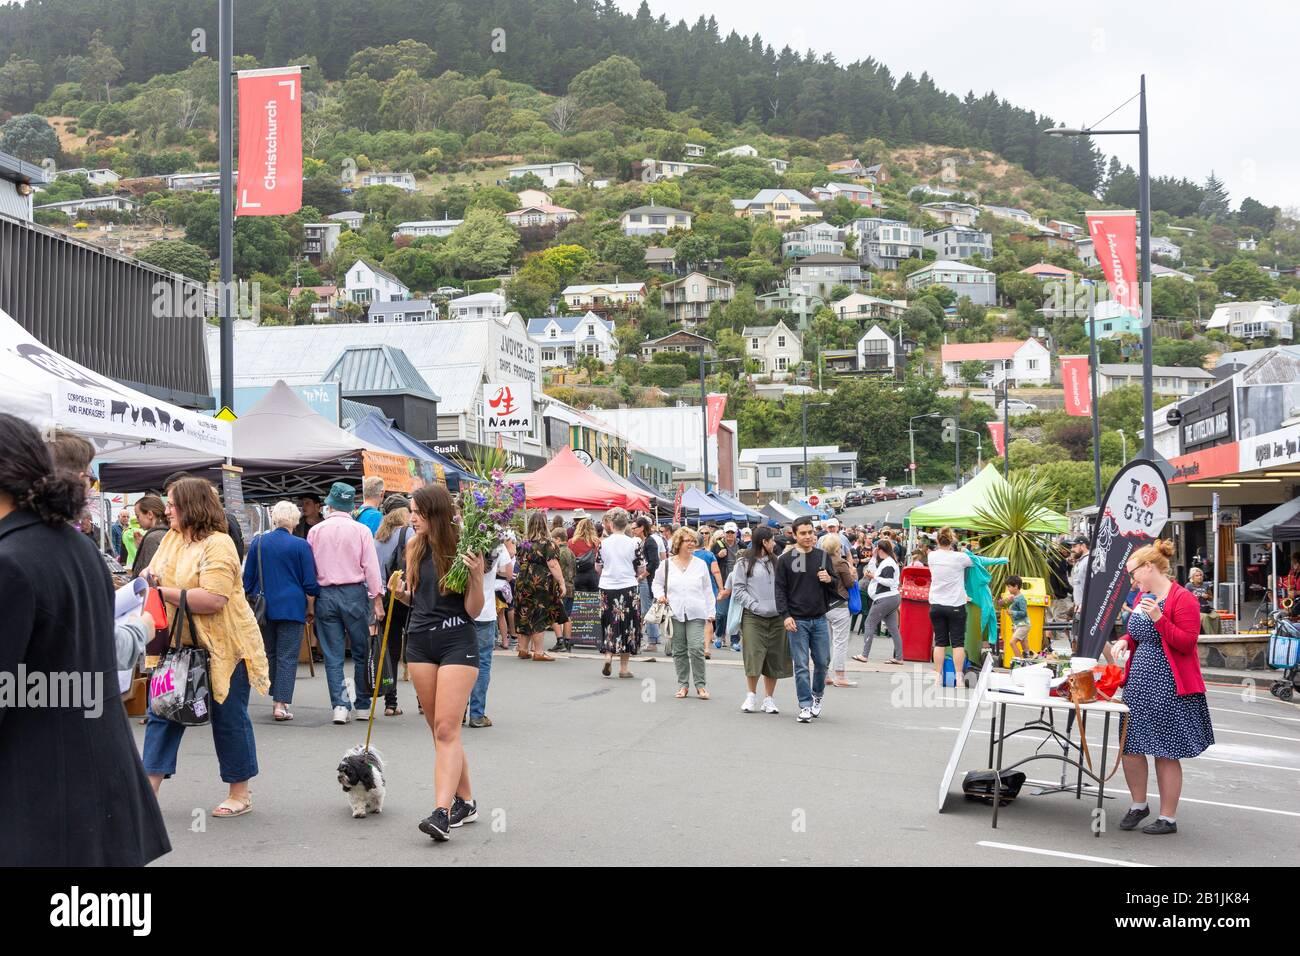 Food stalls at Lyttelton Farmer's Market, Lyttelton, Lyttelton Harbour, Banks Peninsula, Canterbury Region, New Zealand Stock Photo